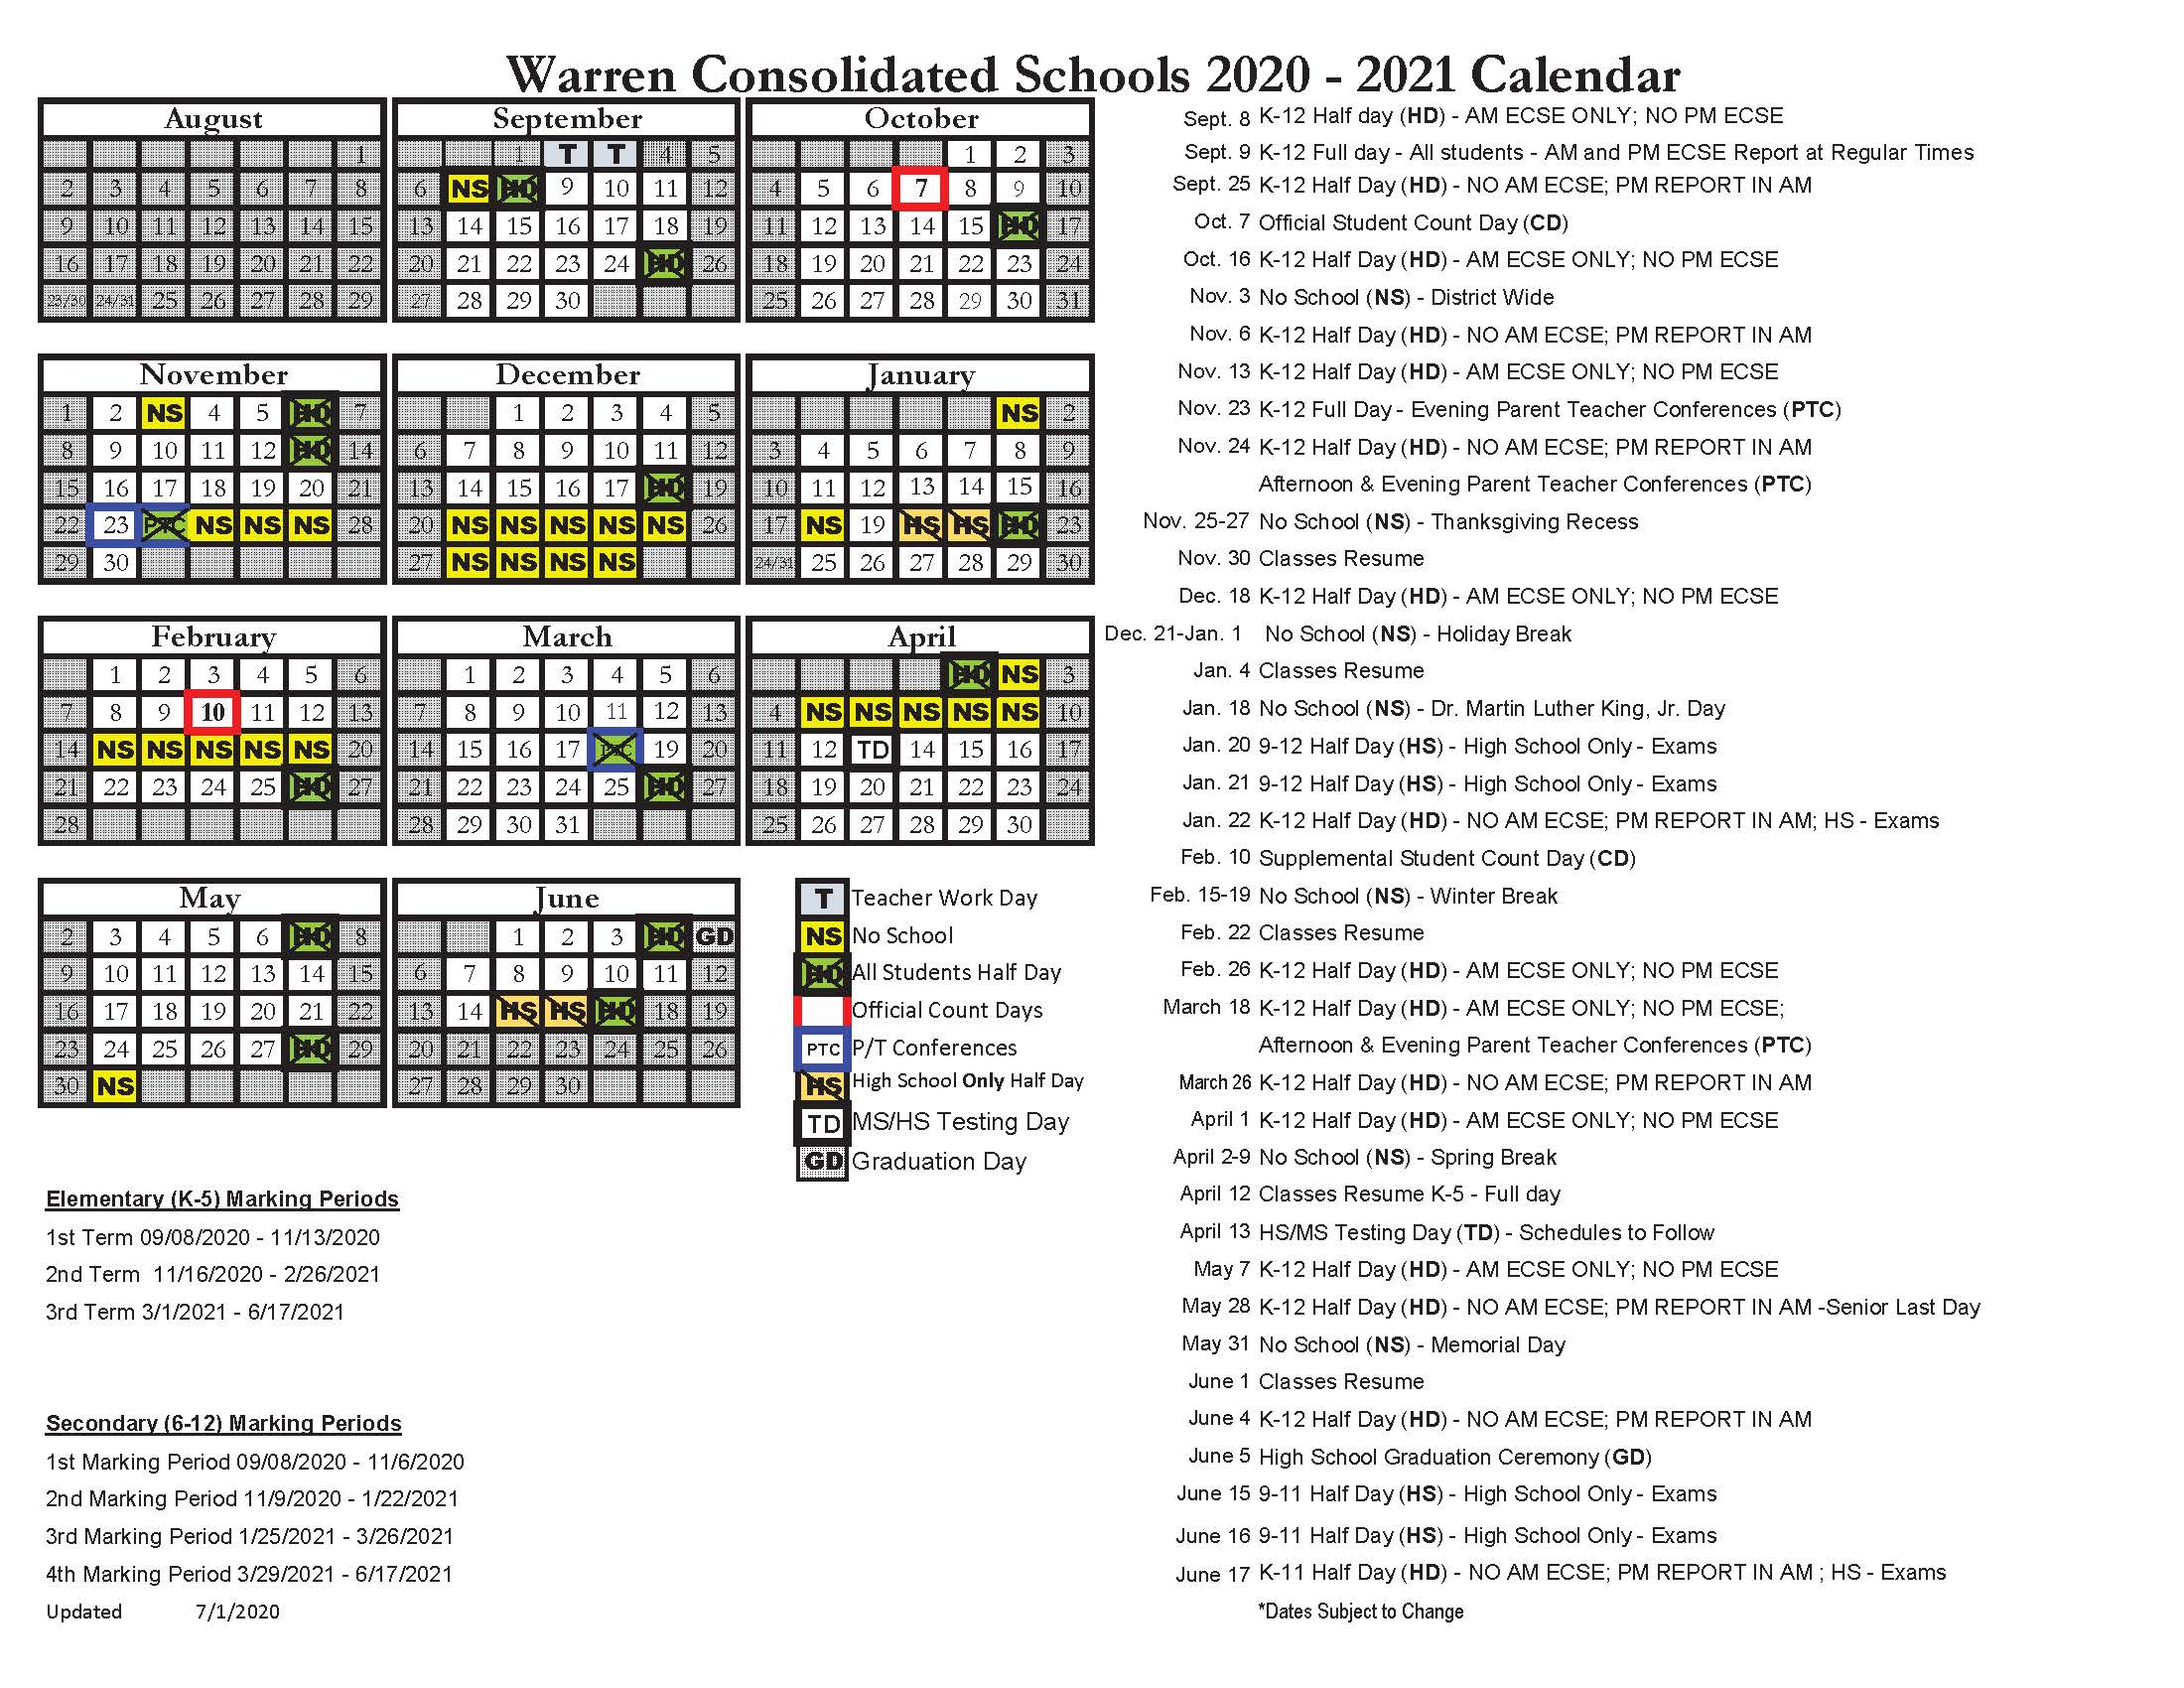 Wcs Calendar 2022.Green Acres Elementary School